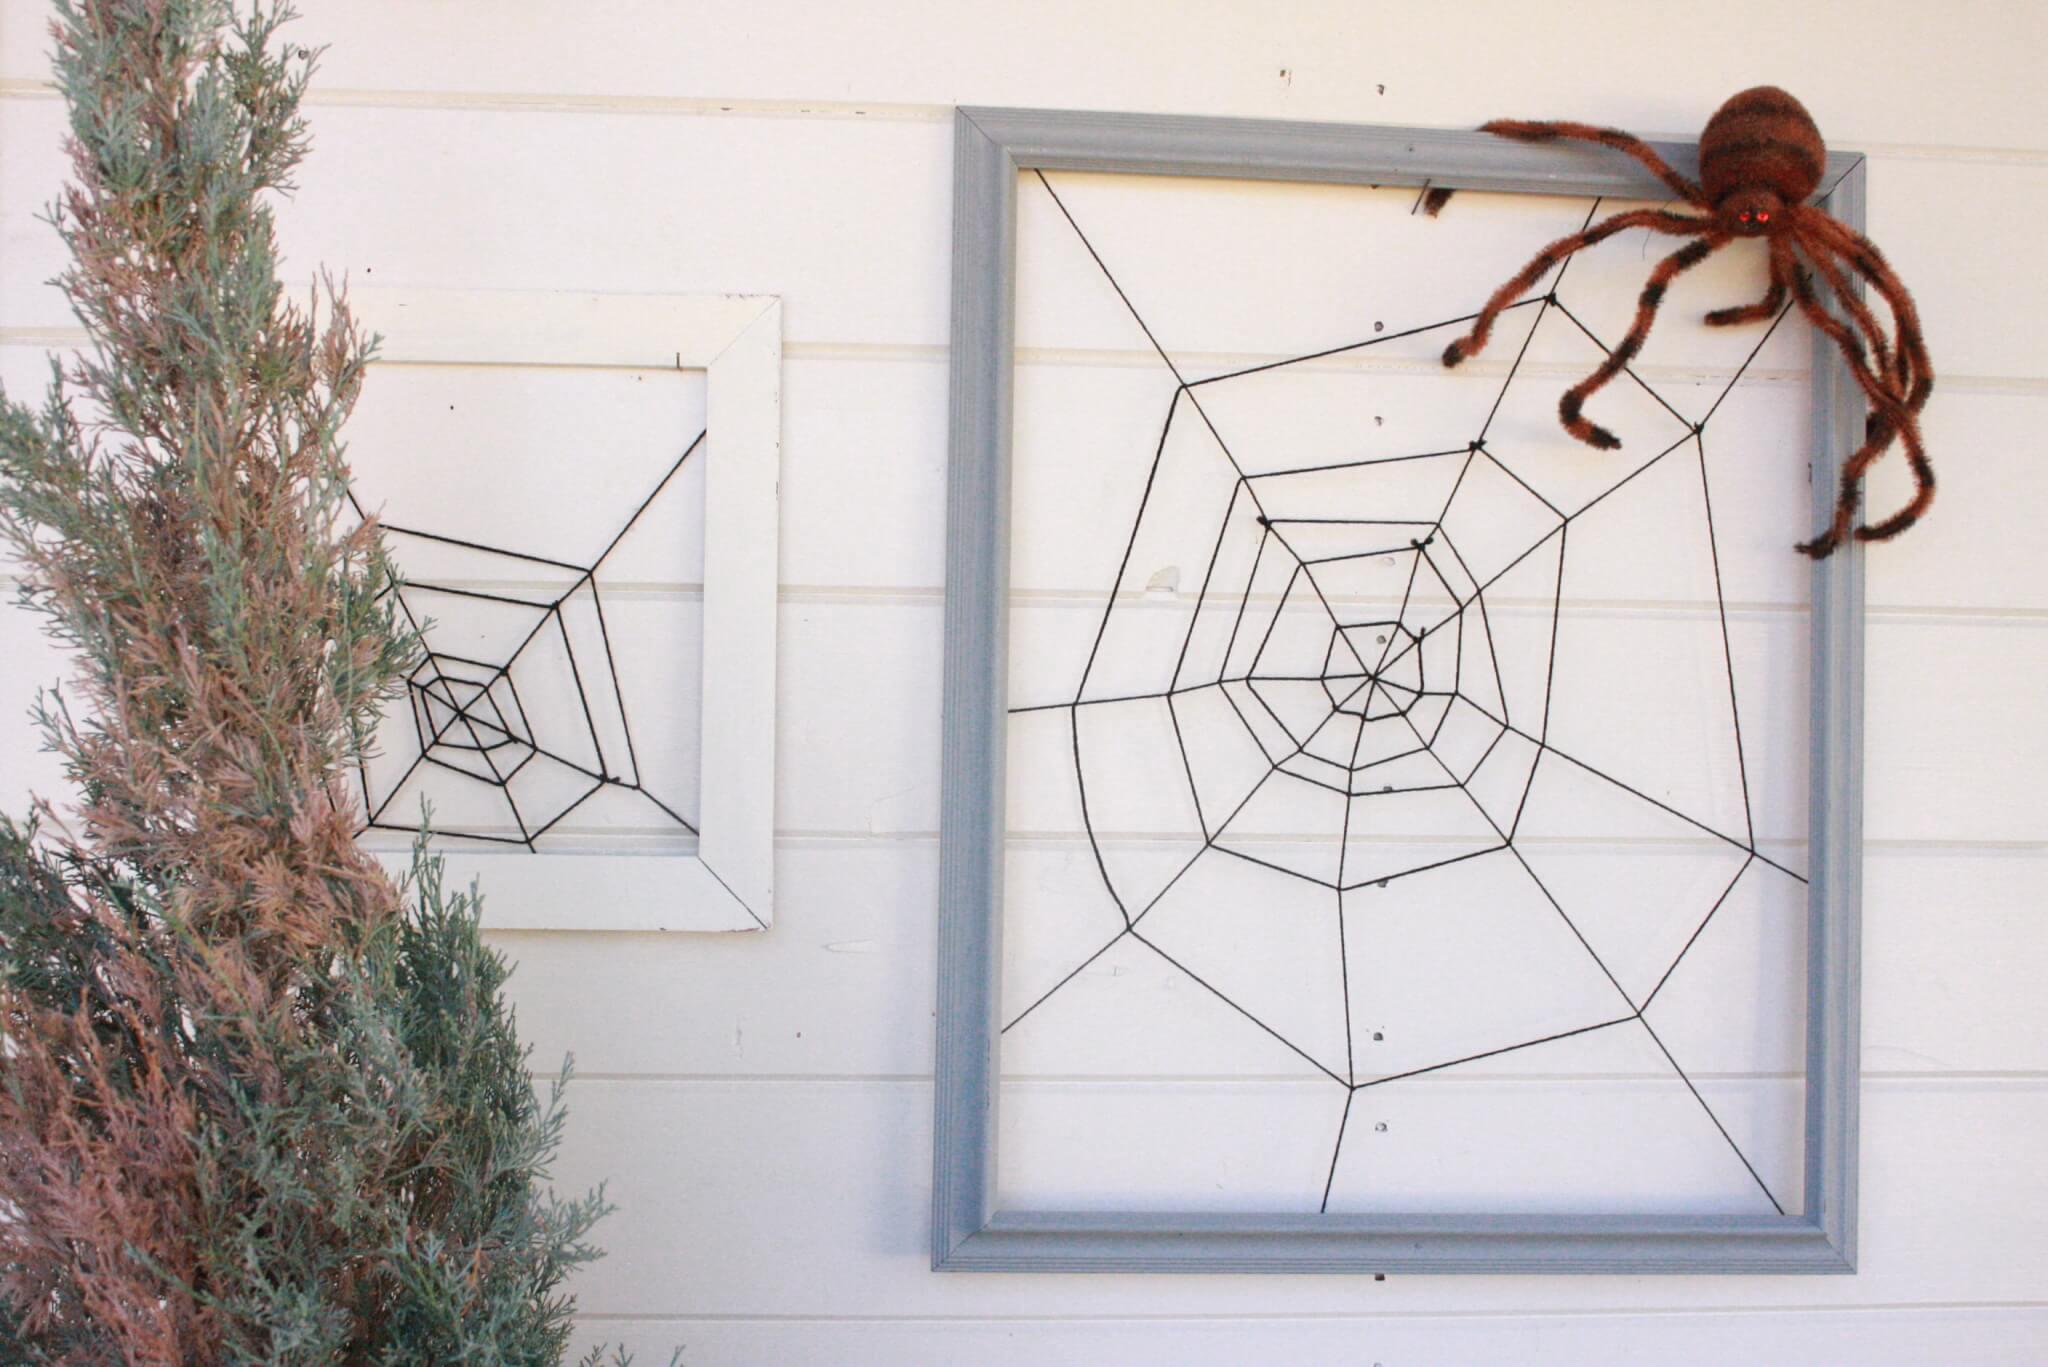 DIY Framed Spiderweb